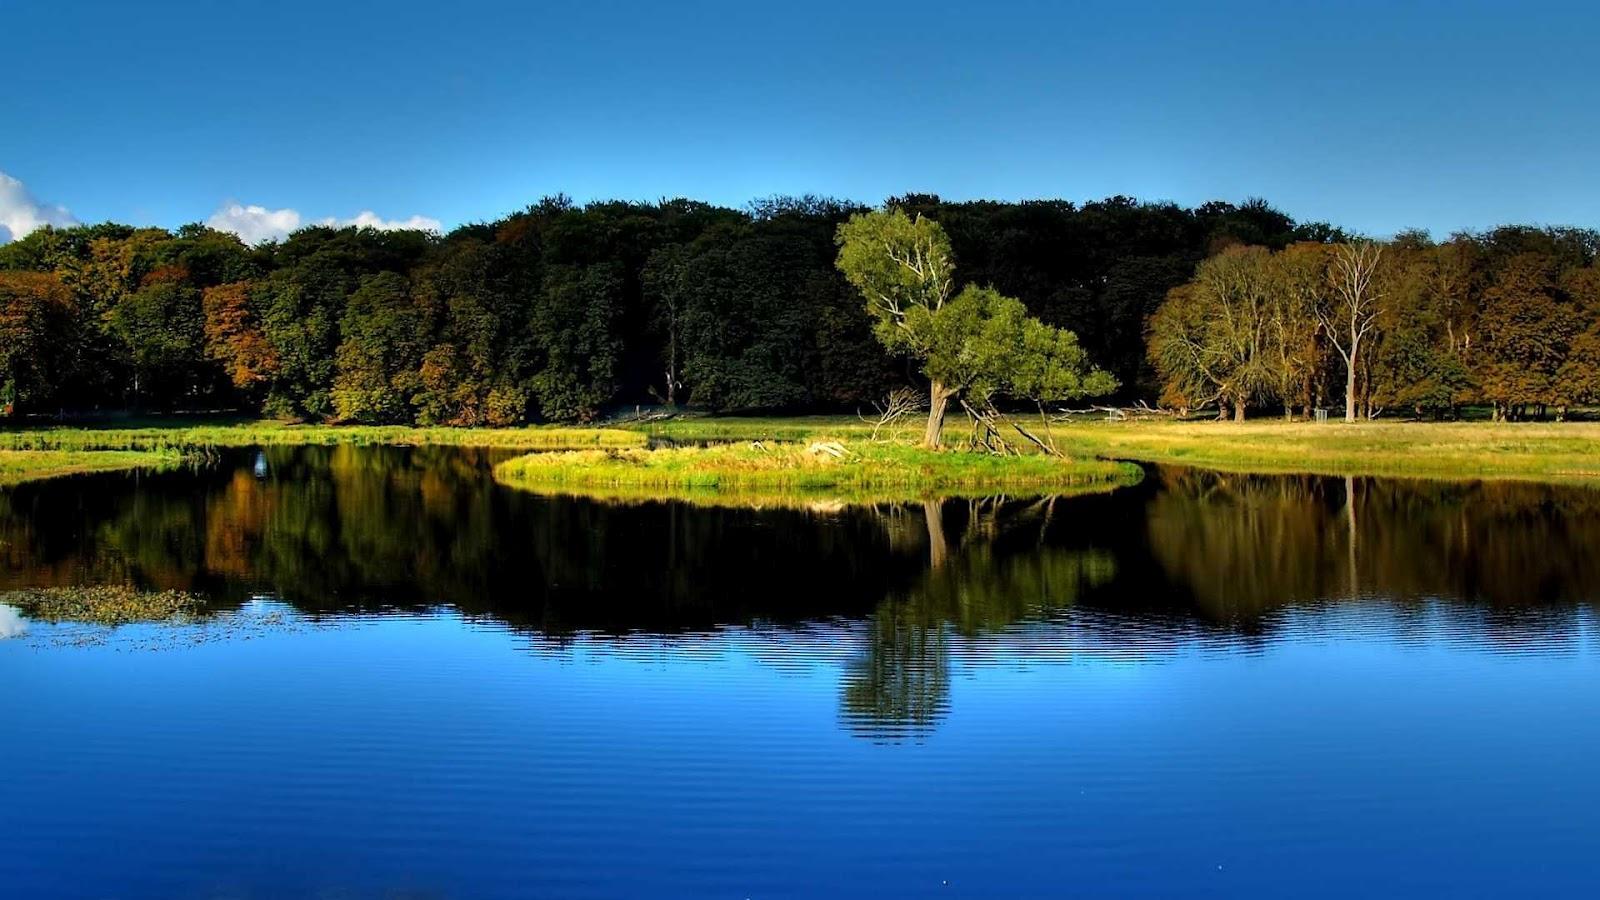 http://1.bp.blogspot.com/-UICBVrFawQQ/UDmsCKKilFI/AAAAAAAAIho/jhS_--1VMnE/s1600/landscapes-full-hd-1080p-set-11.jpg